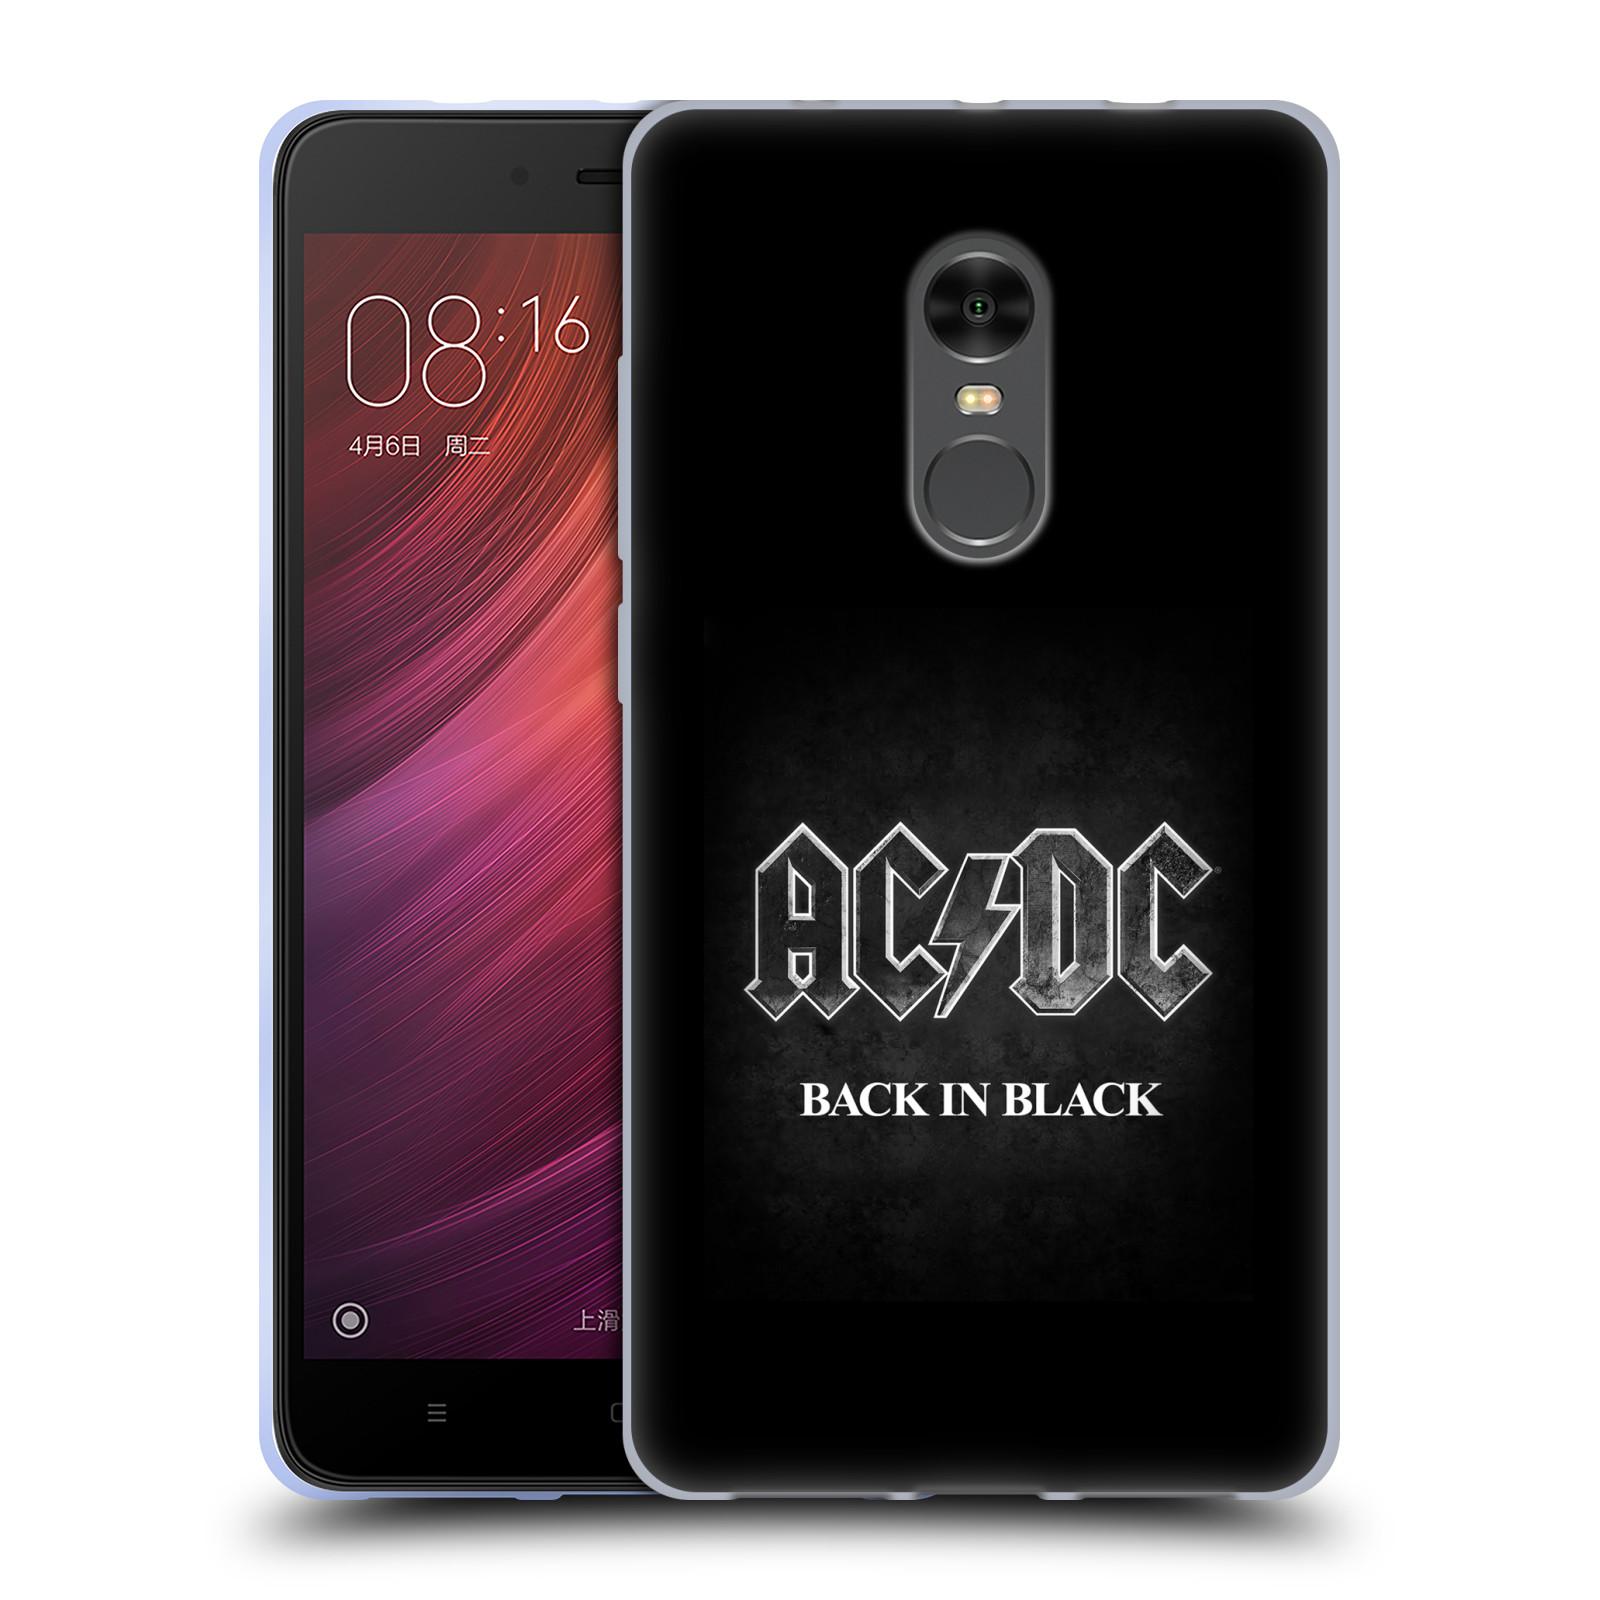 Silikonové pouzdro na mobil Xiaomi Redmi Note 4 - Head Case - AC/DC BACK IN BLACK (Silikonový kryt či obal na mobilní telefon Xiaomi Redmi Note 4 s motivem AC/DC BACK IN BLACK)